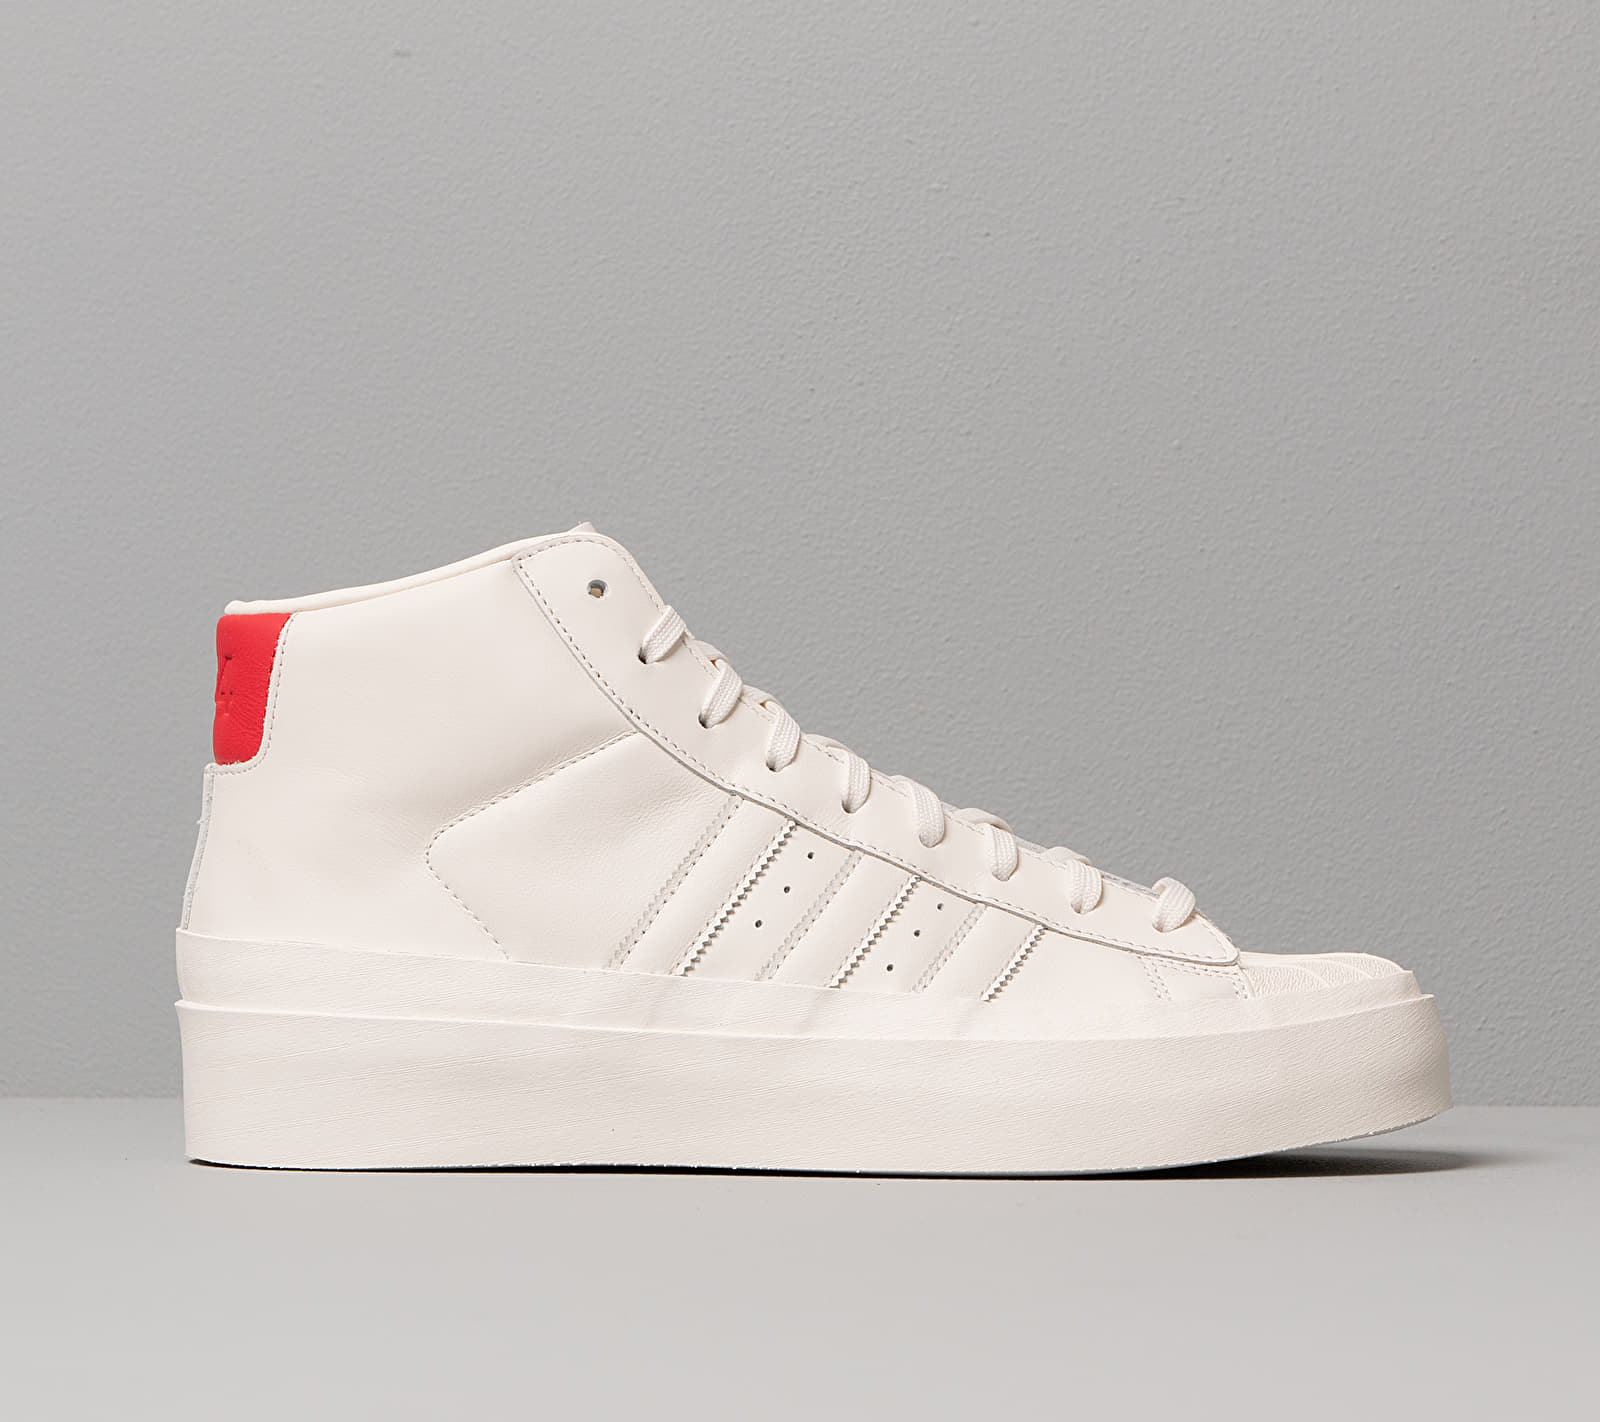 adidas x 424 Pro Model Core White/ Core White/ Core White